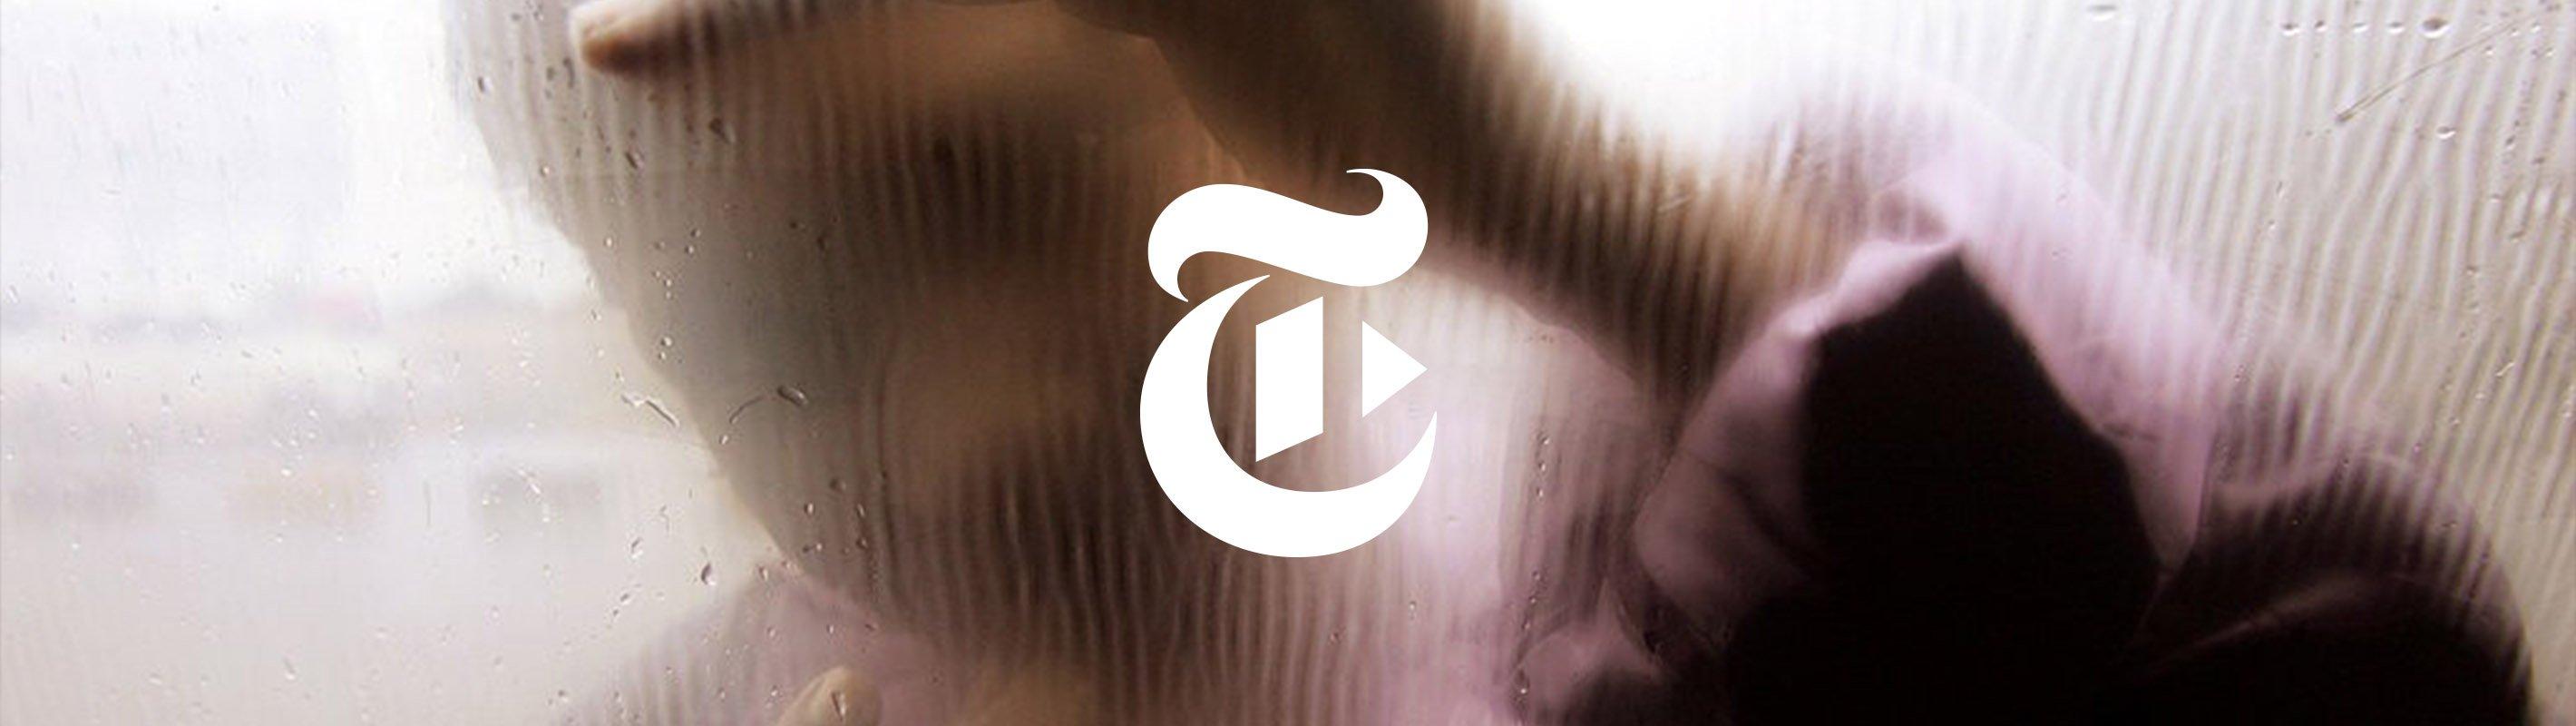 New York Times video branding logo